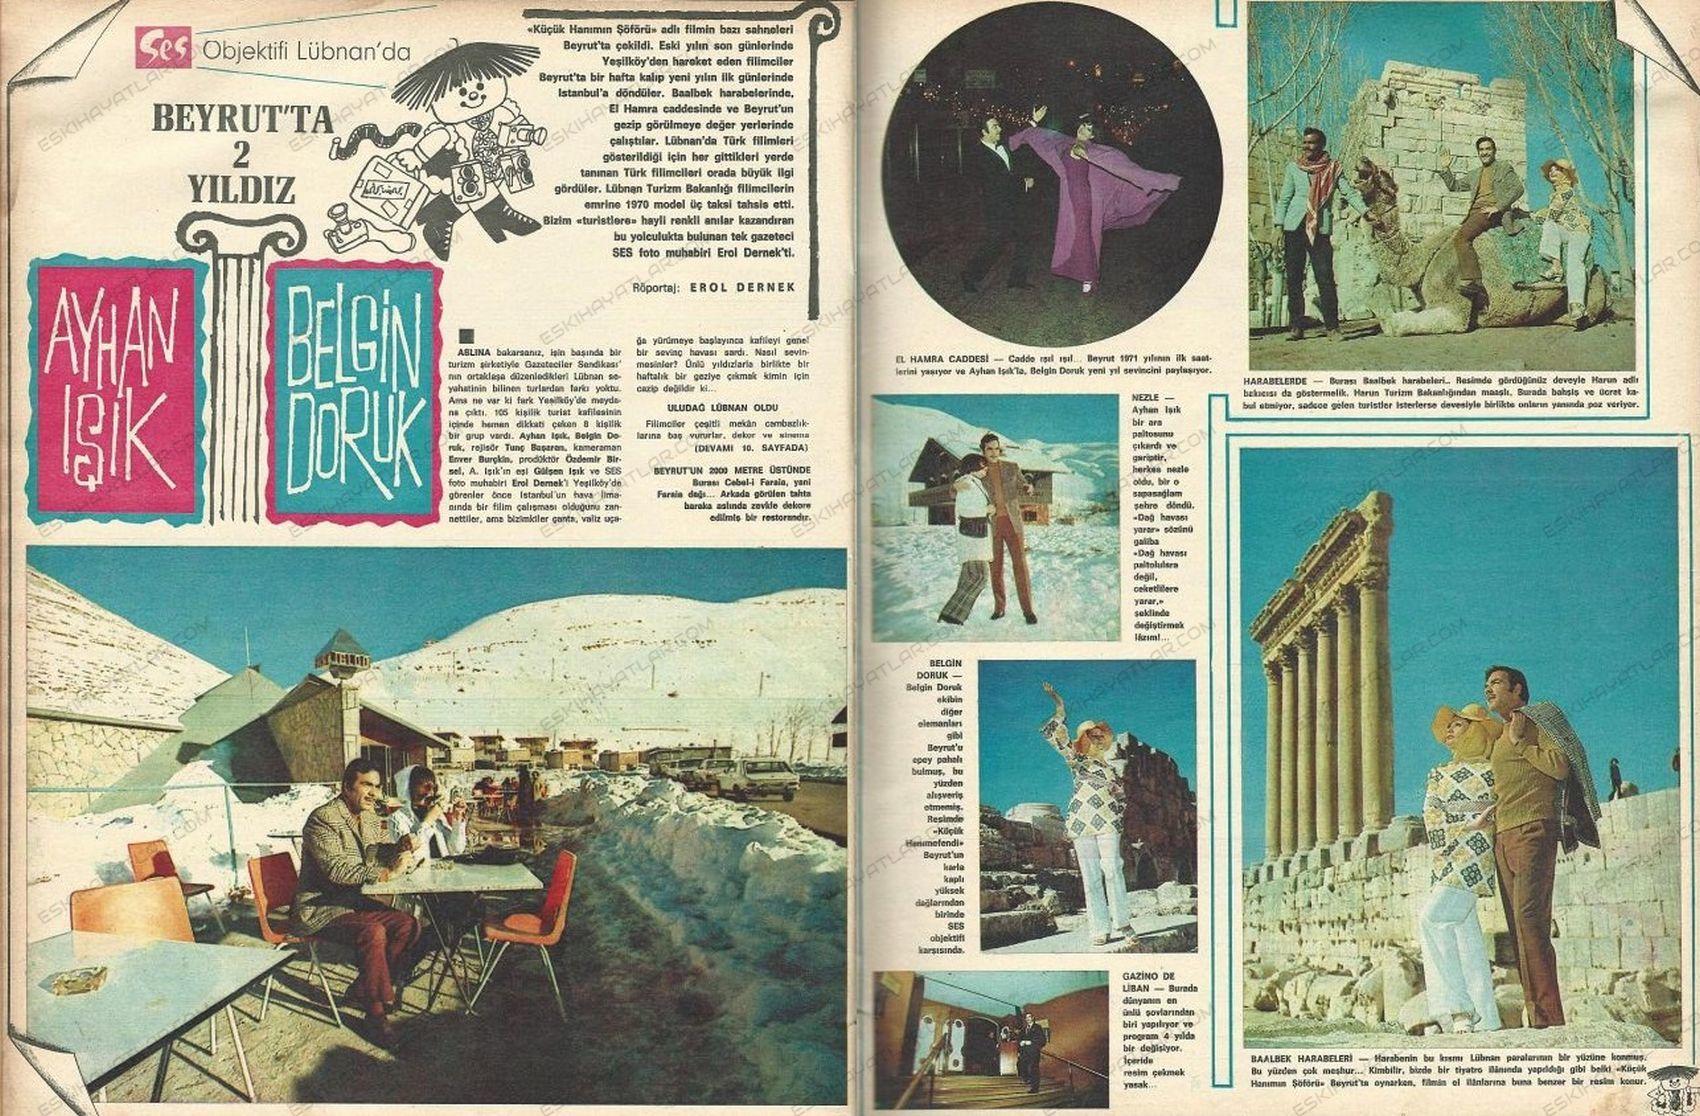 0214-ayhan-isik-1971-ses-dergisi-belgin-doruk (5)